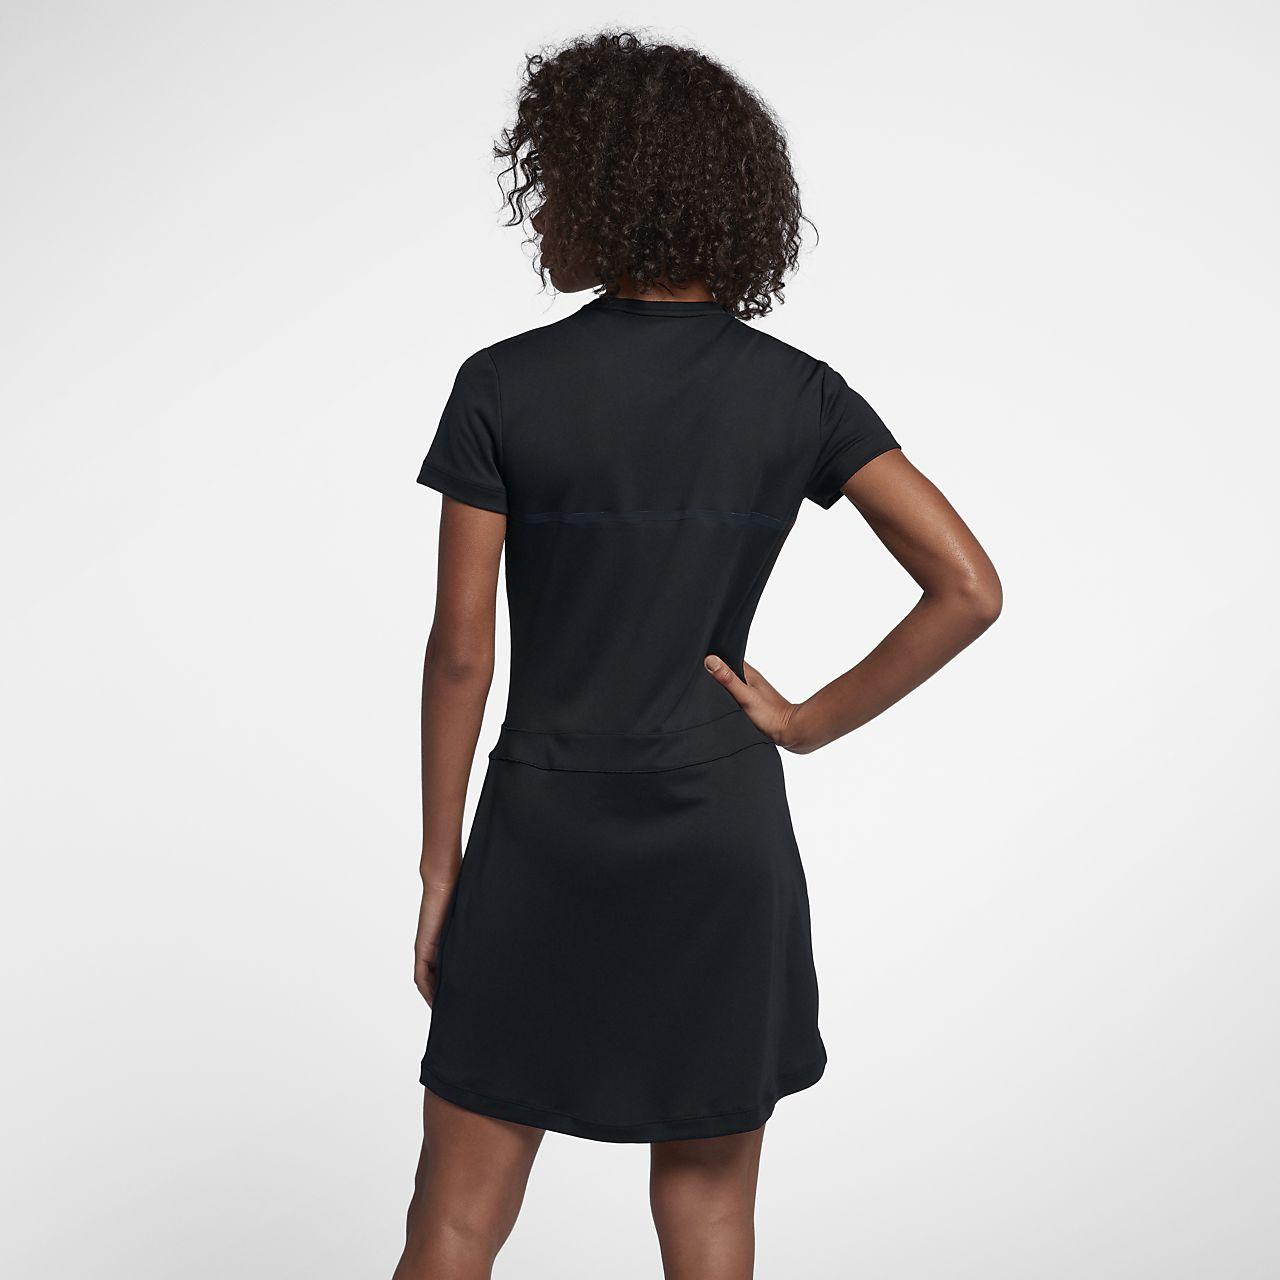 ... Nike Dri-FIT Women's Short Sleeve Golf Dress